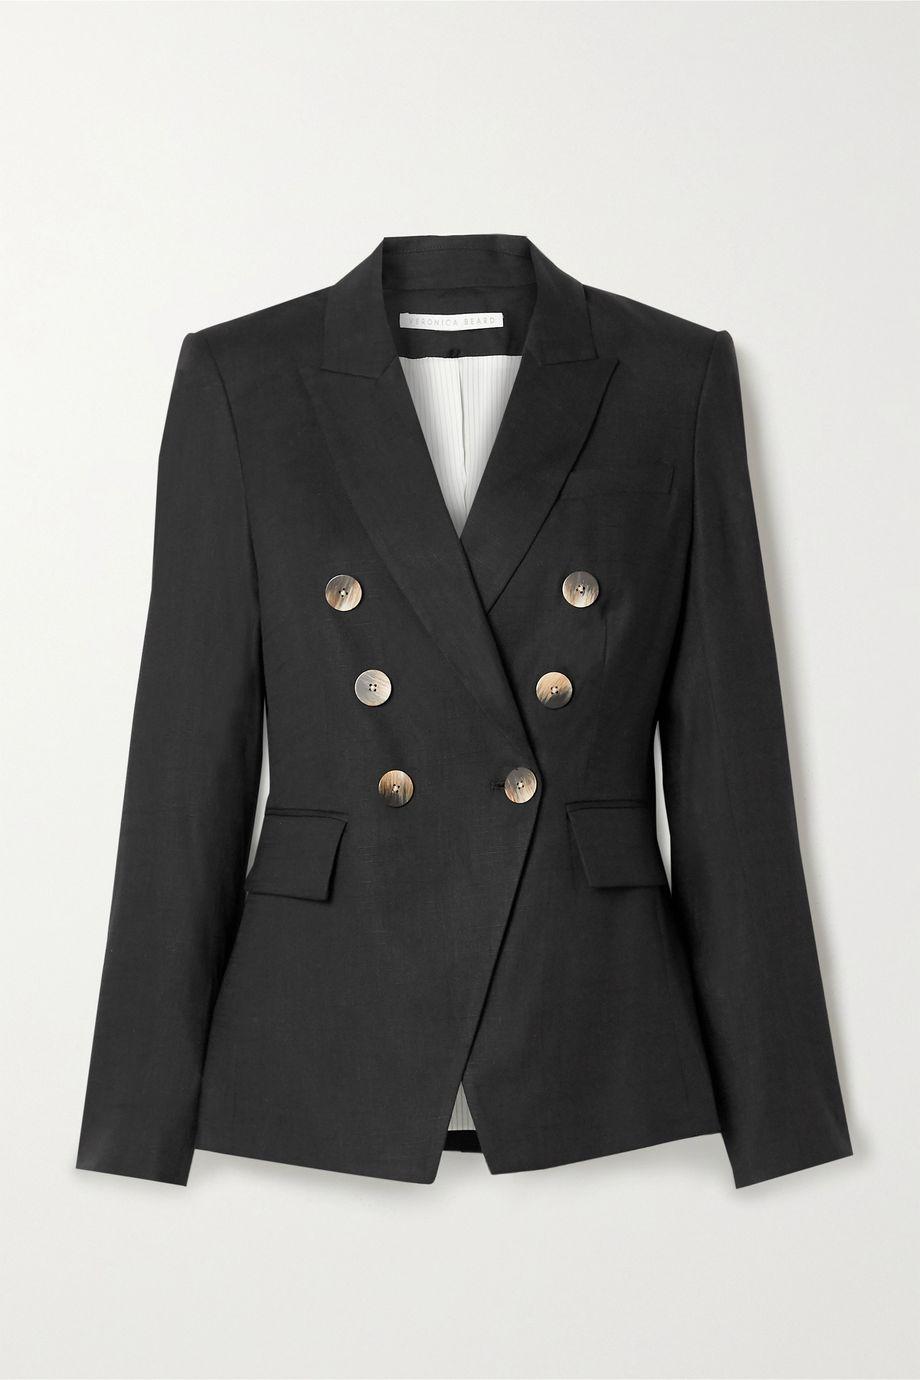 Veronica Beard Lonny Dickey double-breasted linen-blend blazer